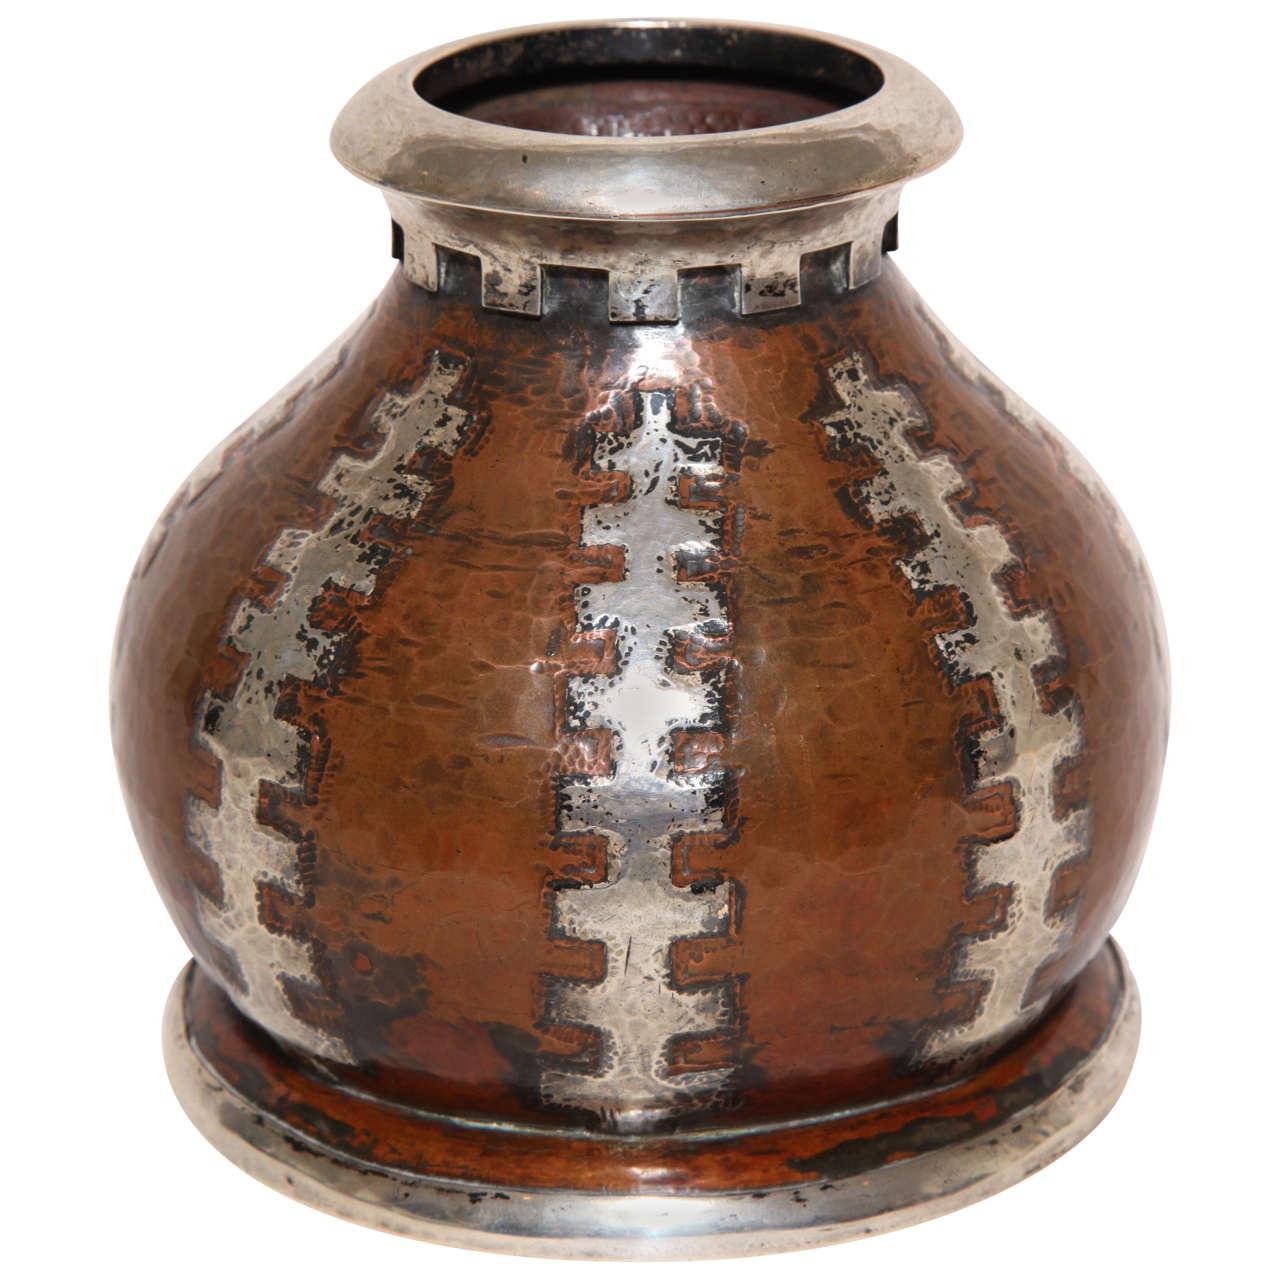 jean serriere art deco copper and silver dinanderie vase at 1stdibs. Black Bedroom Furniture Sets. Home Design Ideas